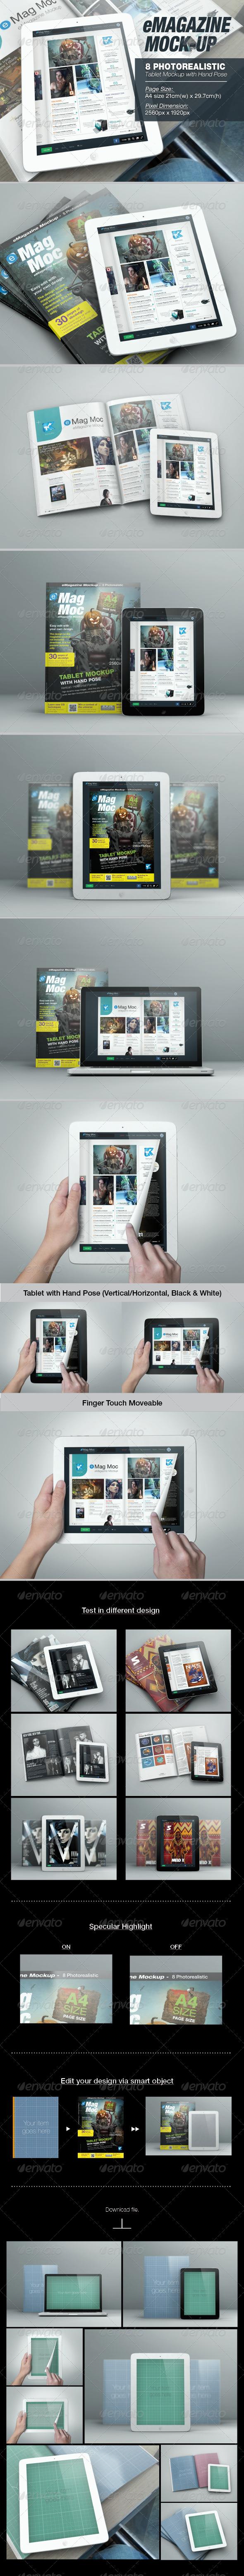 GraphicRiver eMagazine Mock-up 6957906